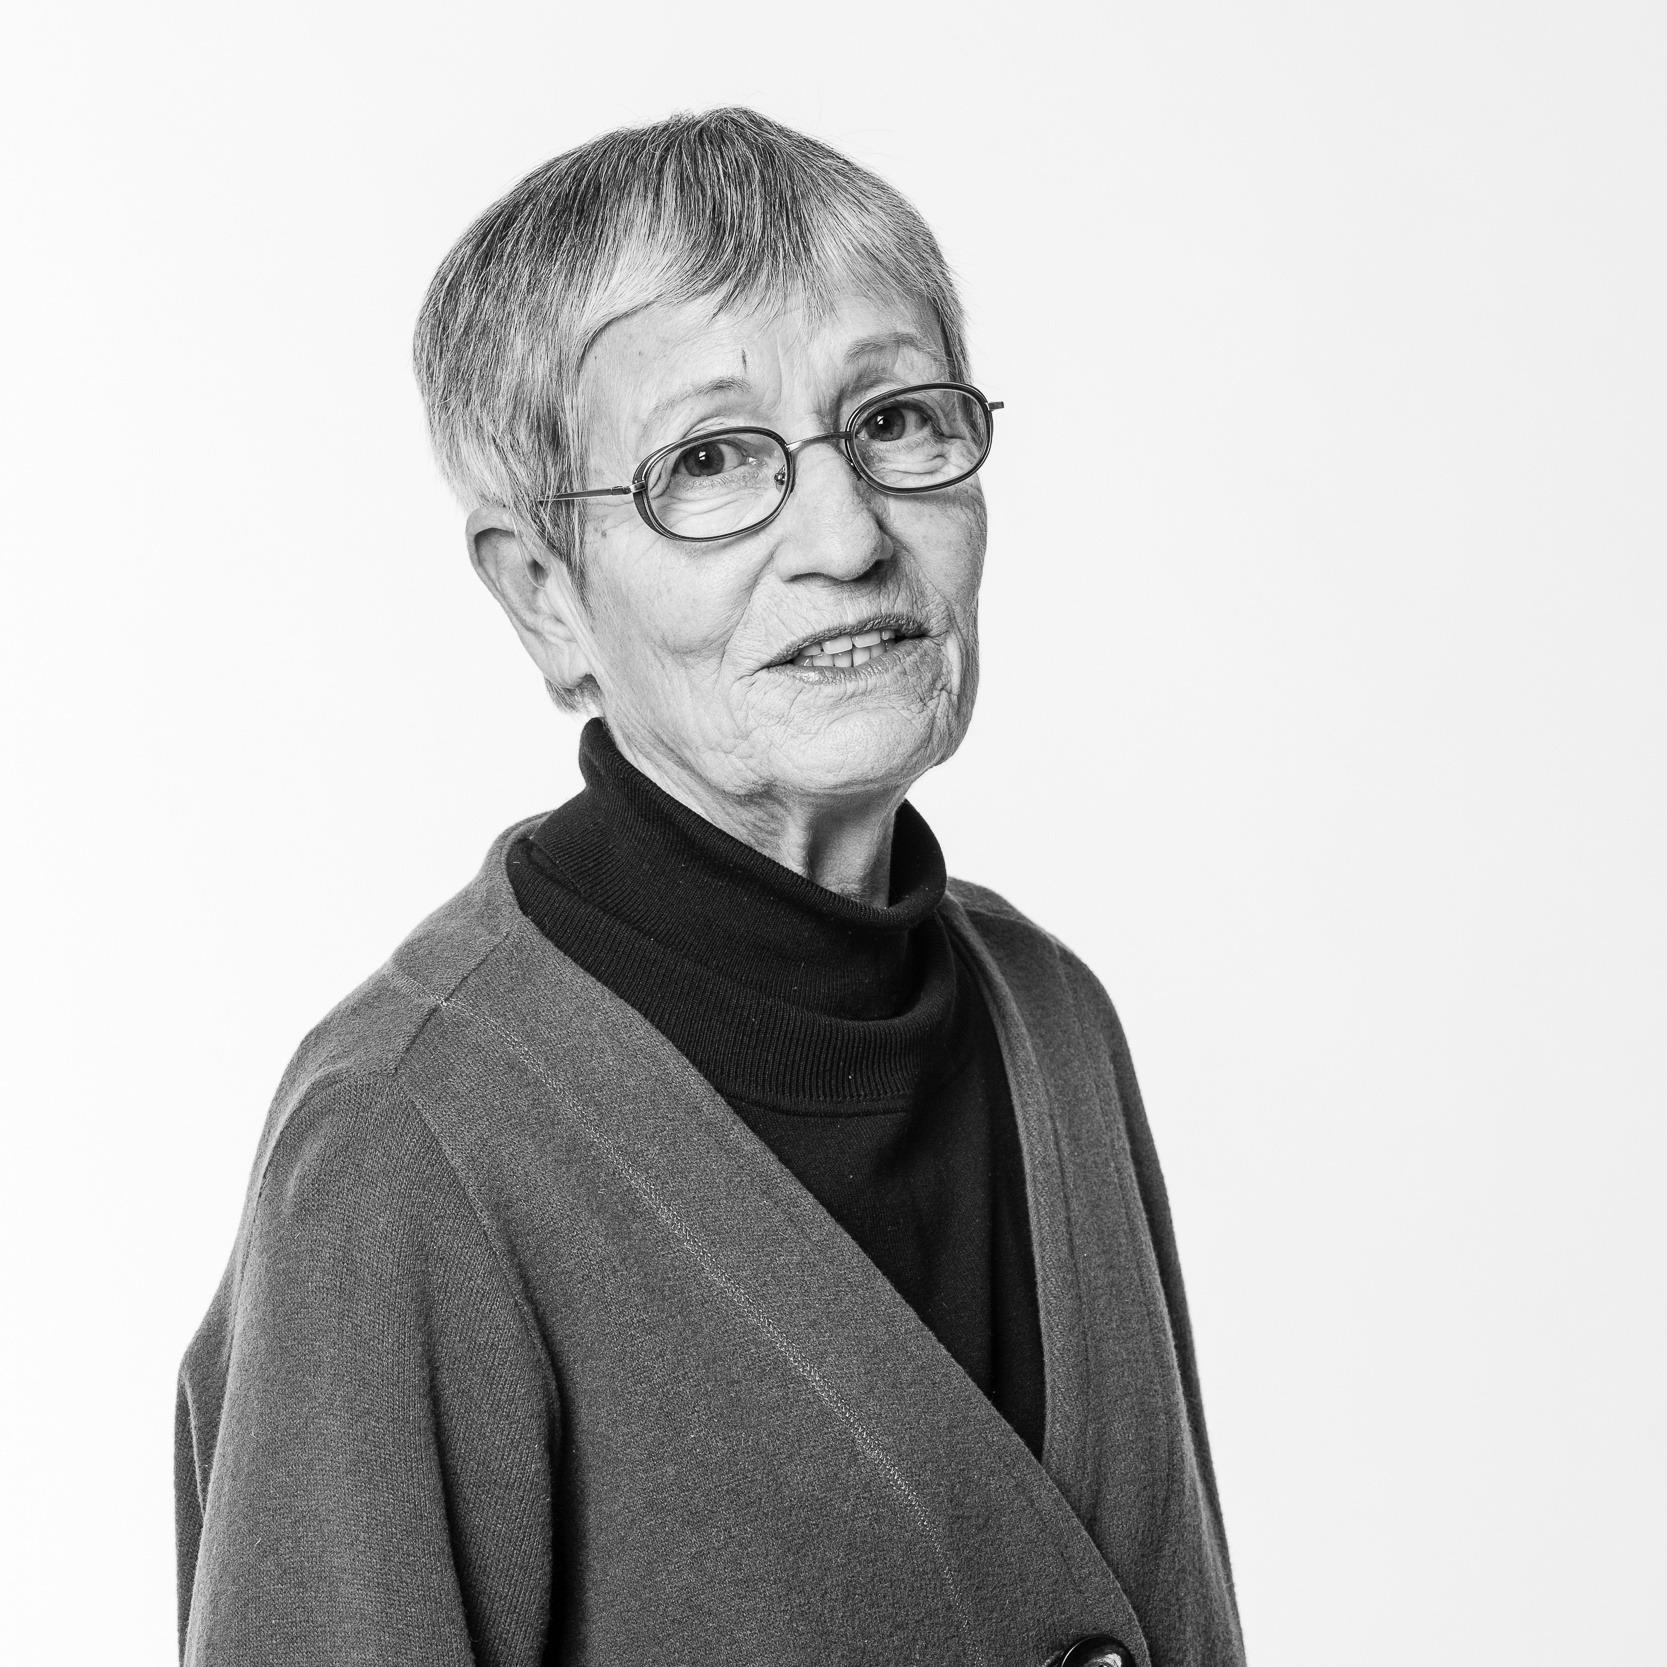 Ursula Streubel